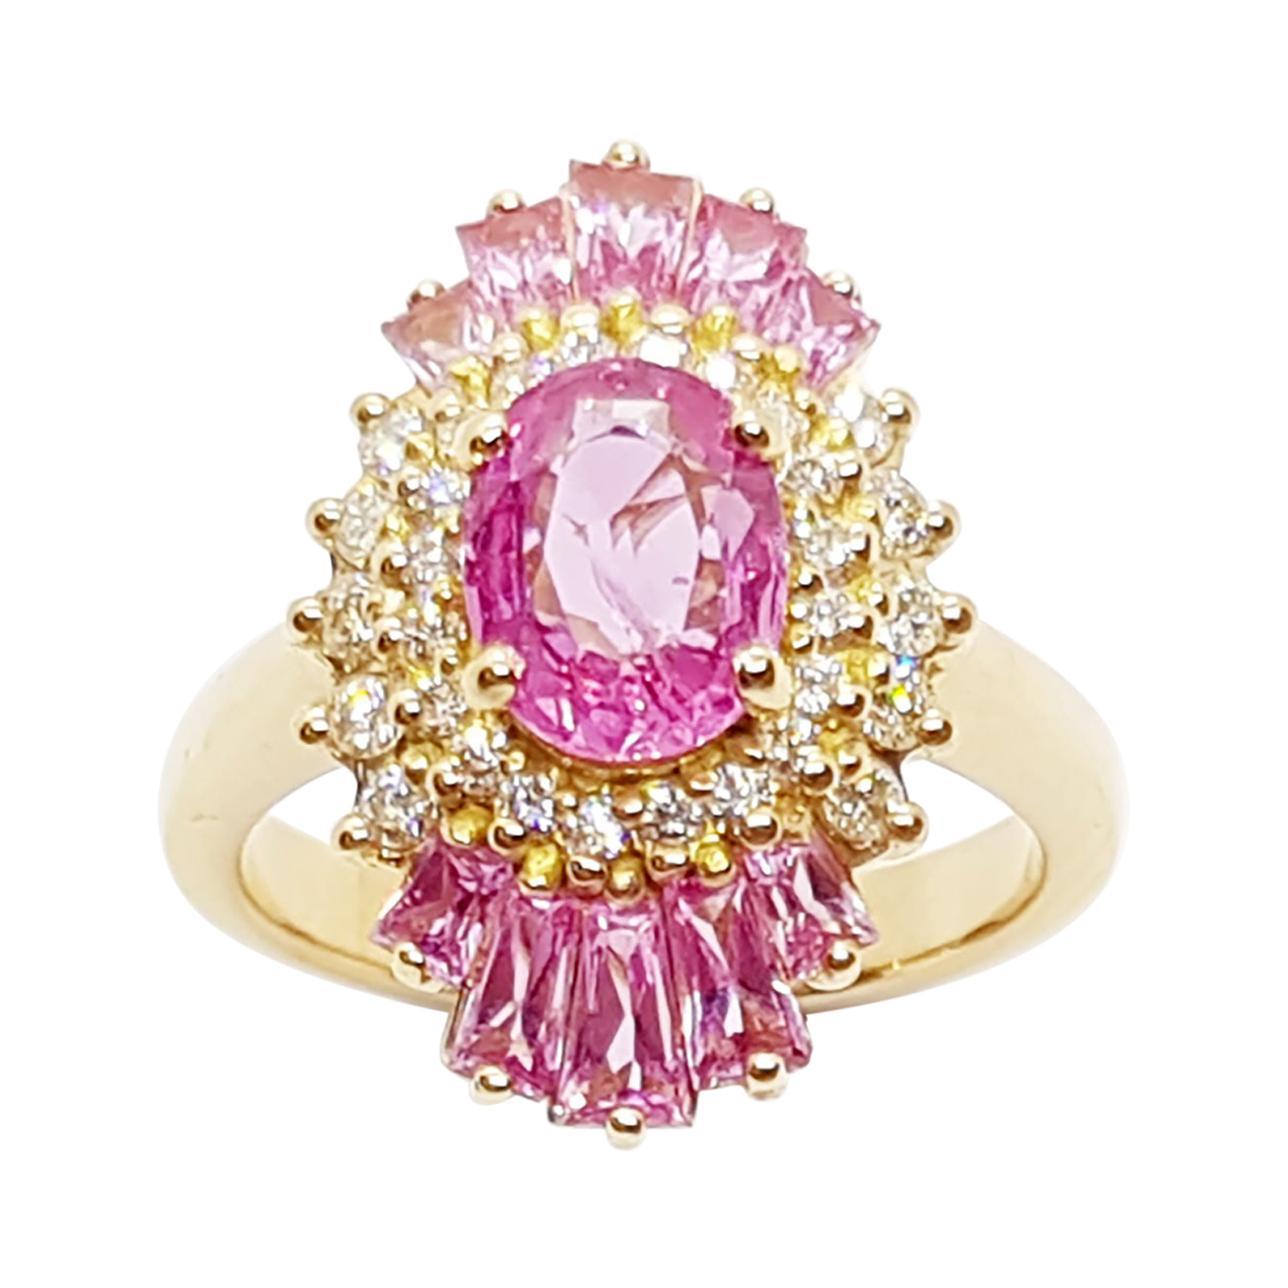 Pink Sapphire with Diamond Ring Set in 18 Karat Rose Gold Settings